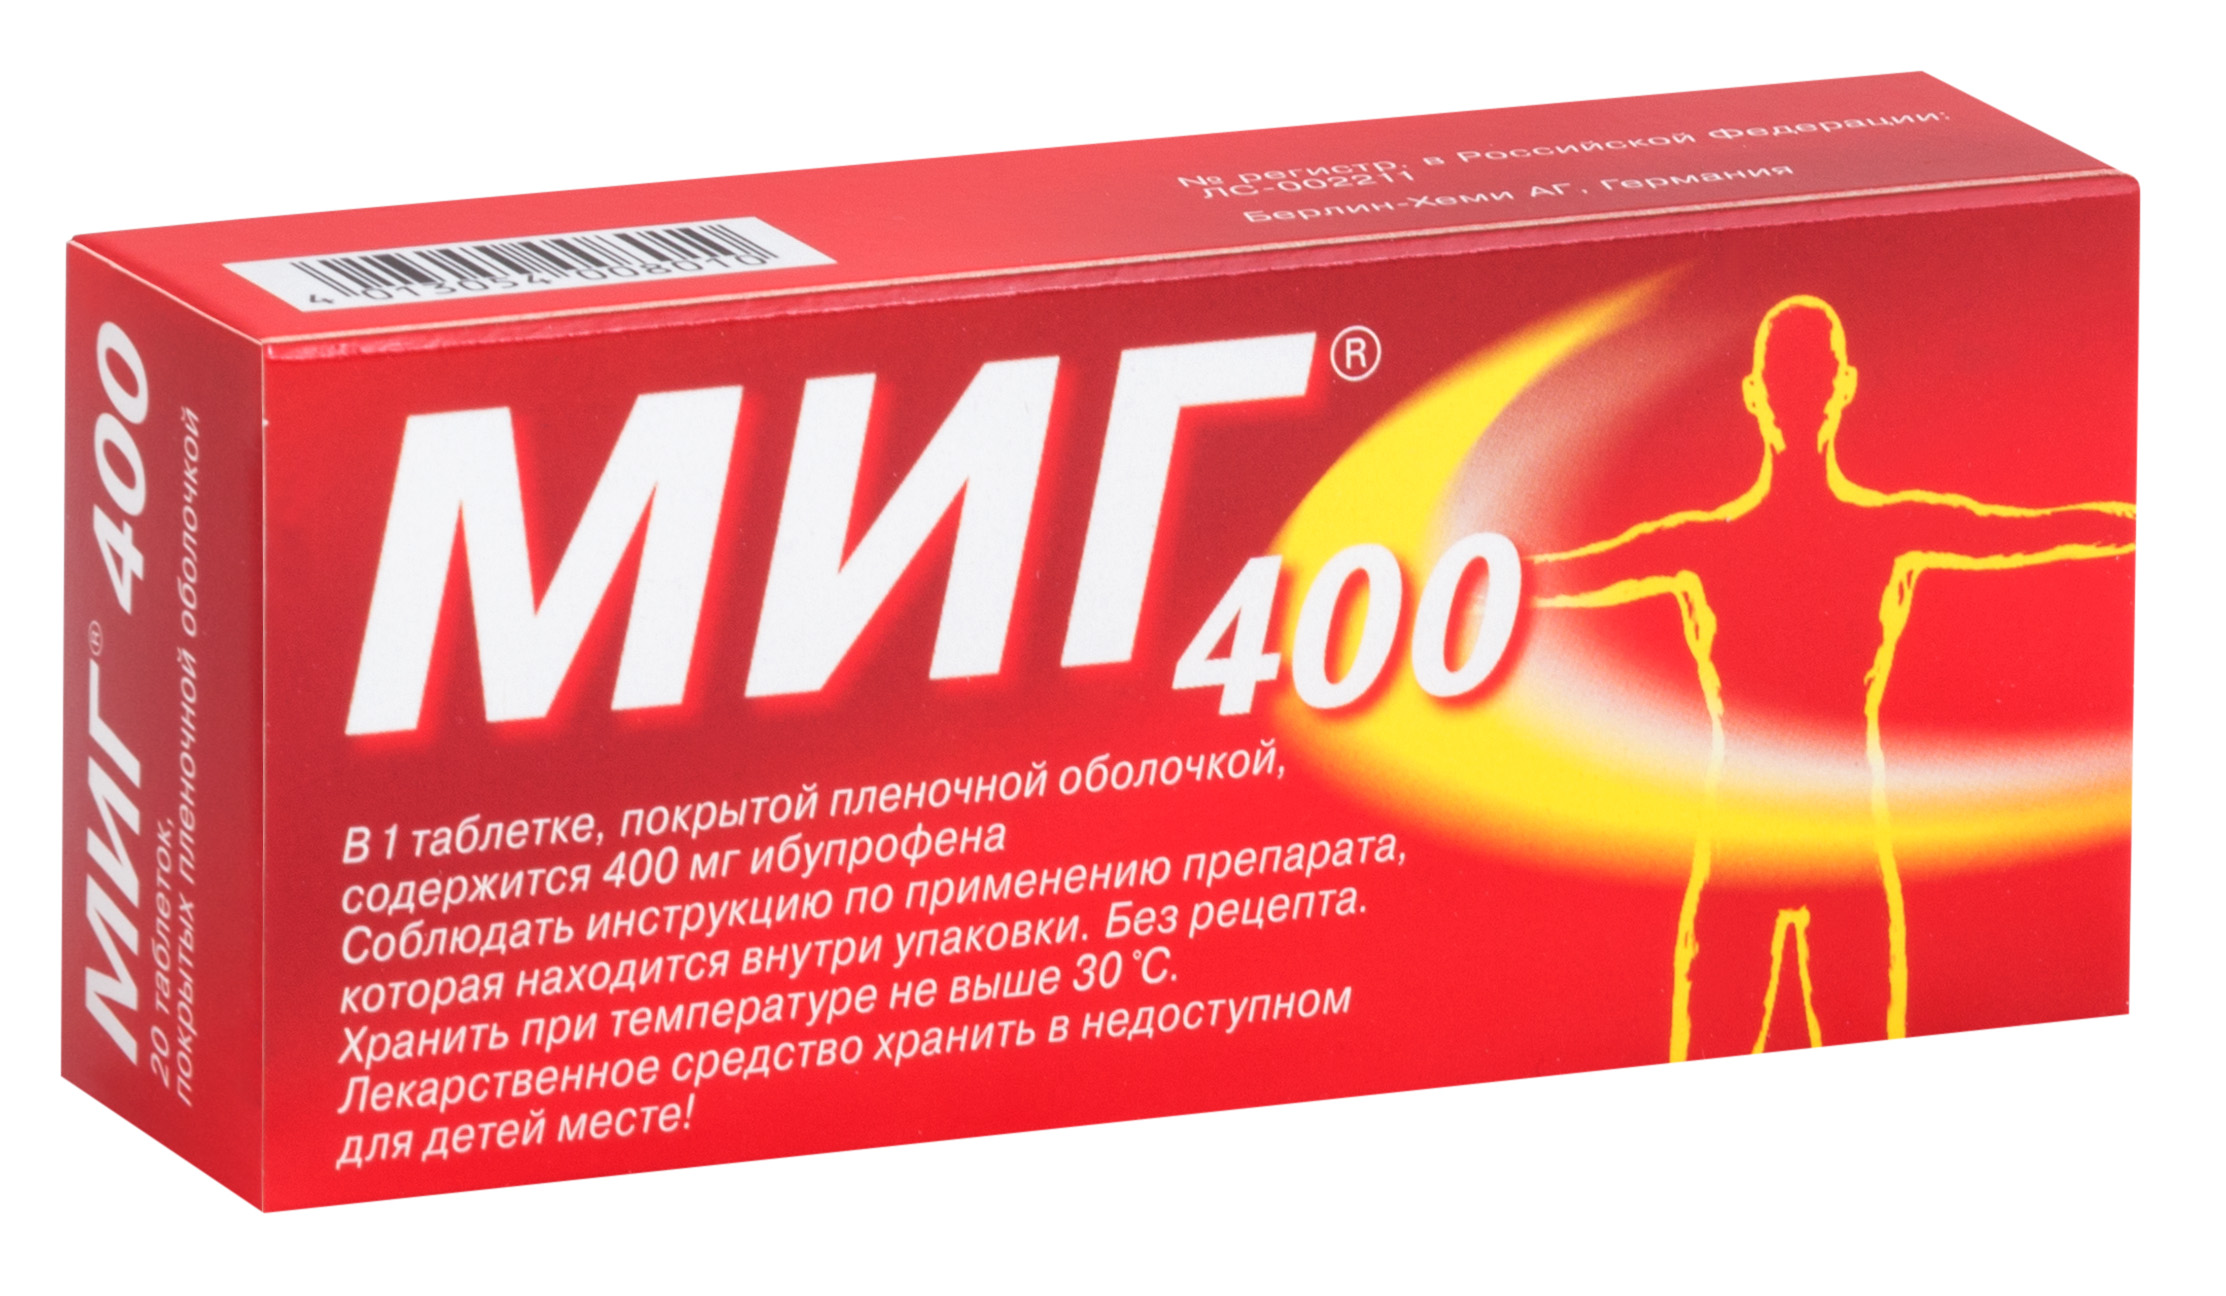 Миг таб. п.п.о. 400мг n20